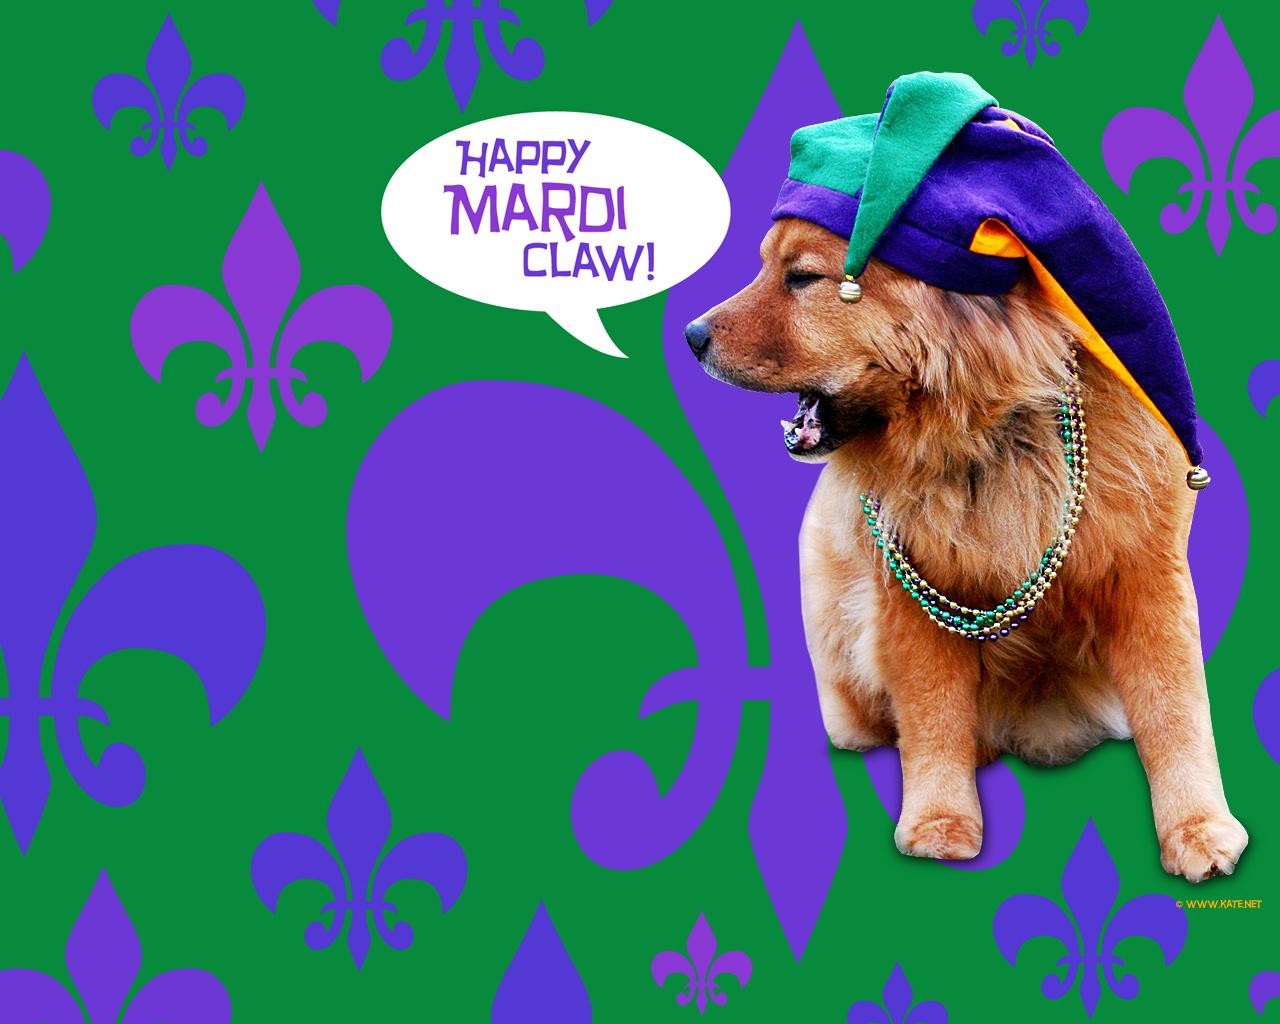 Mardi Gras Wallpapers Mardi Gras Backgrounds by Katenet 1280x1024